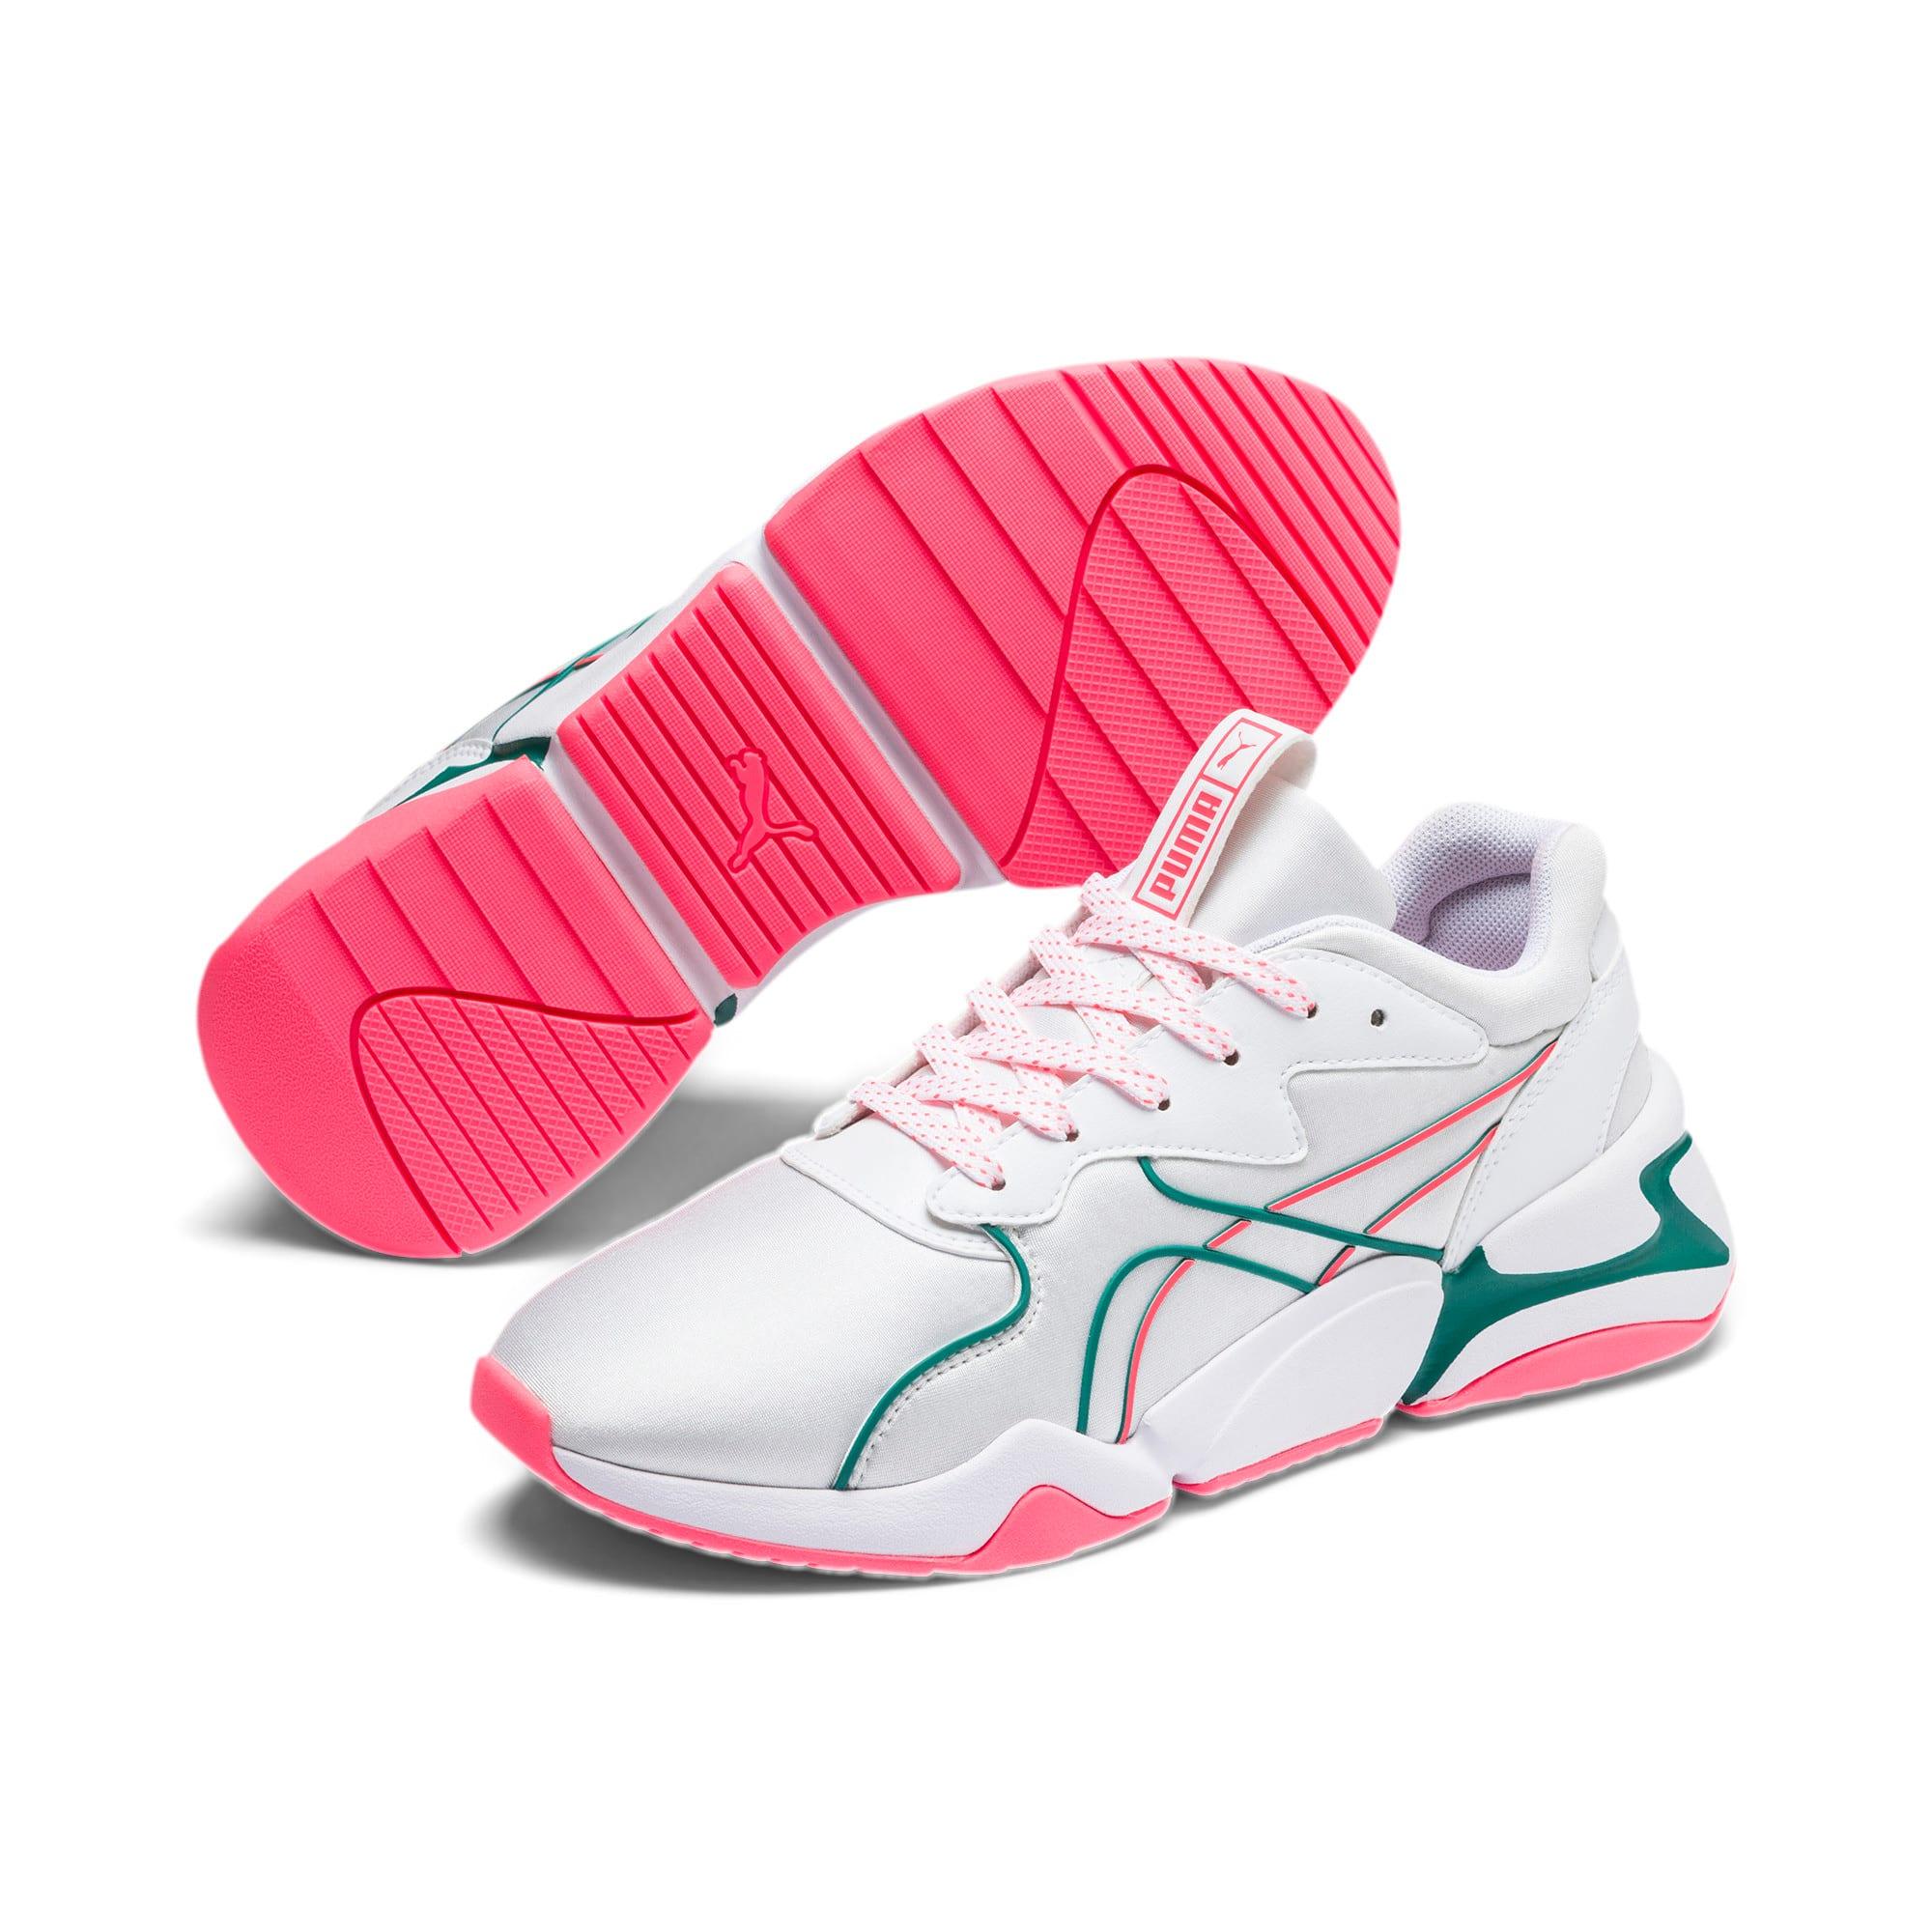 Thumbnail 3 van Nova Hypertech IMEVA - Sportschoenen voor vrouwen, Puma White, medium